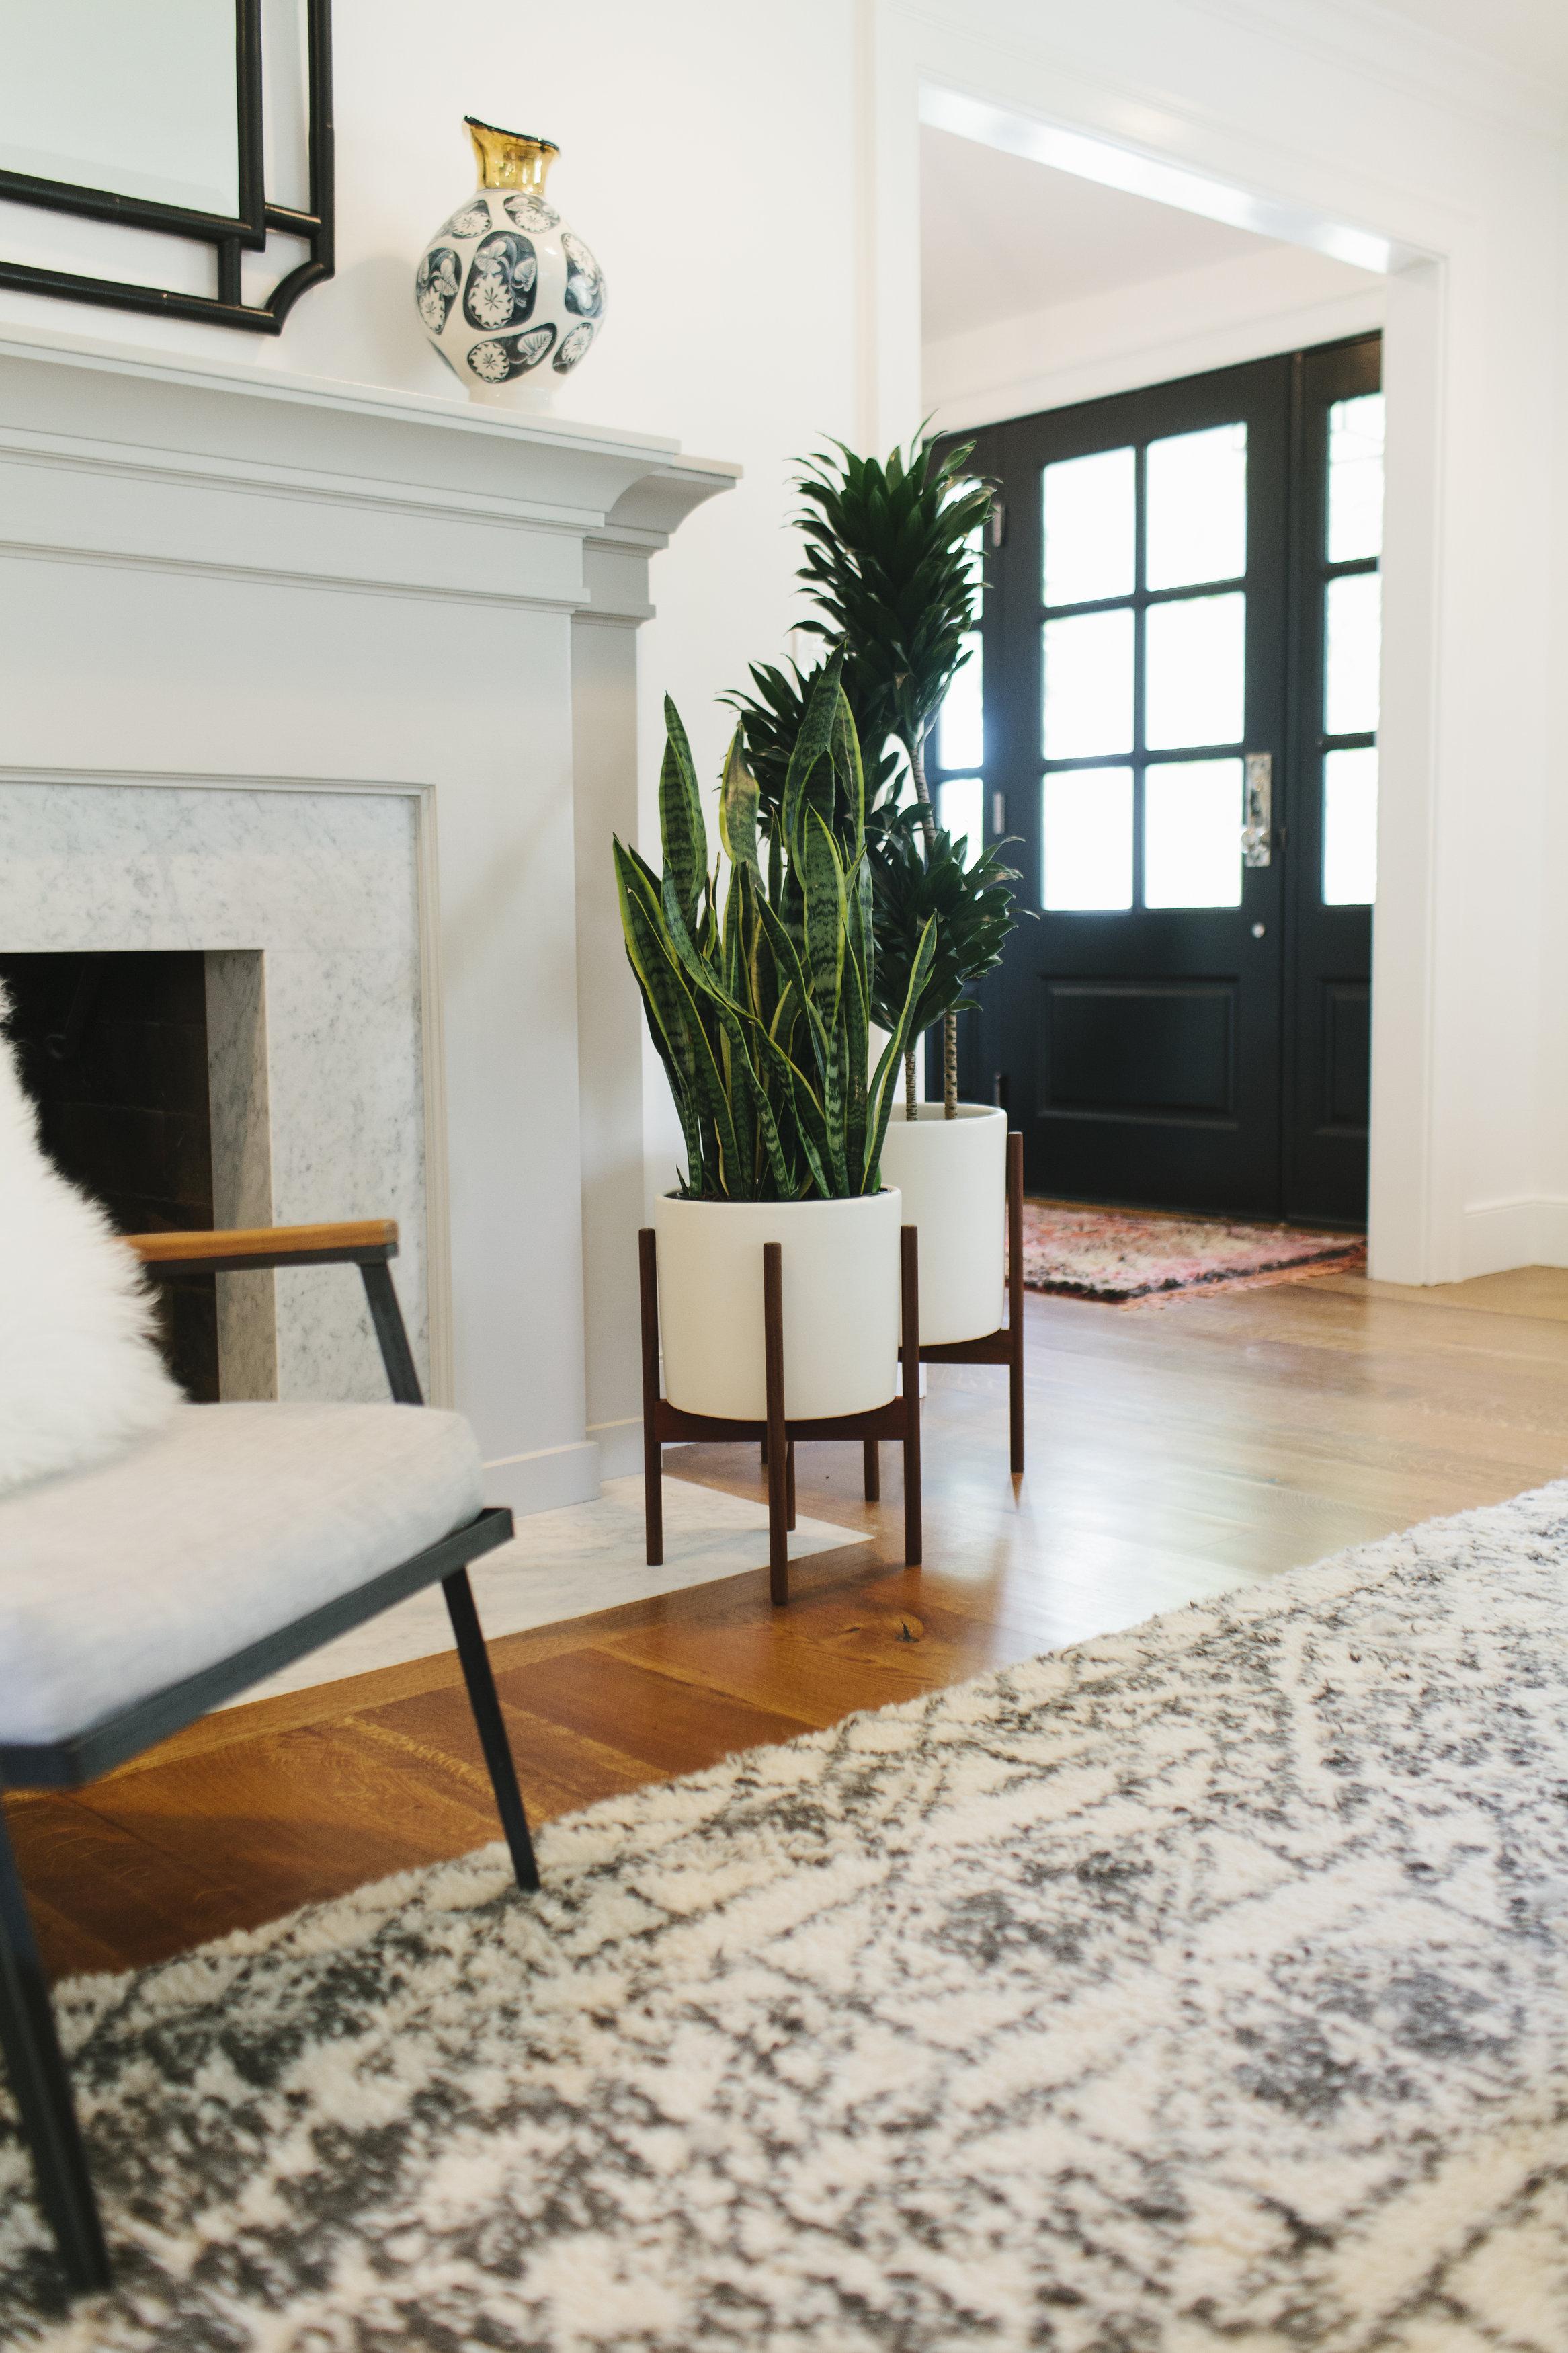 Studio McGee - Lynwood Remodel Fireplace/Entry